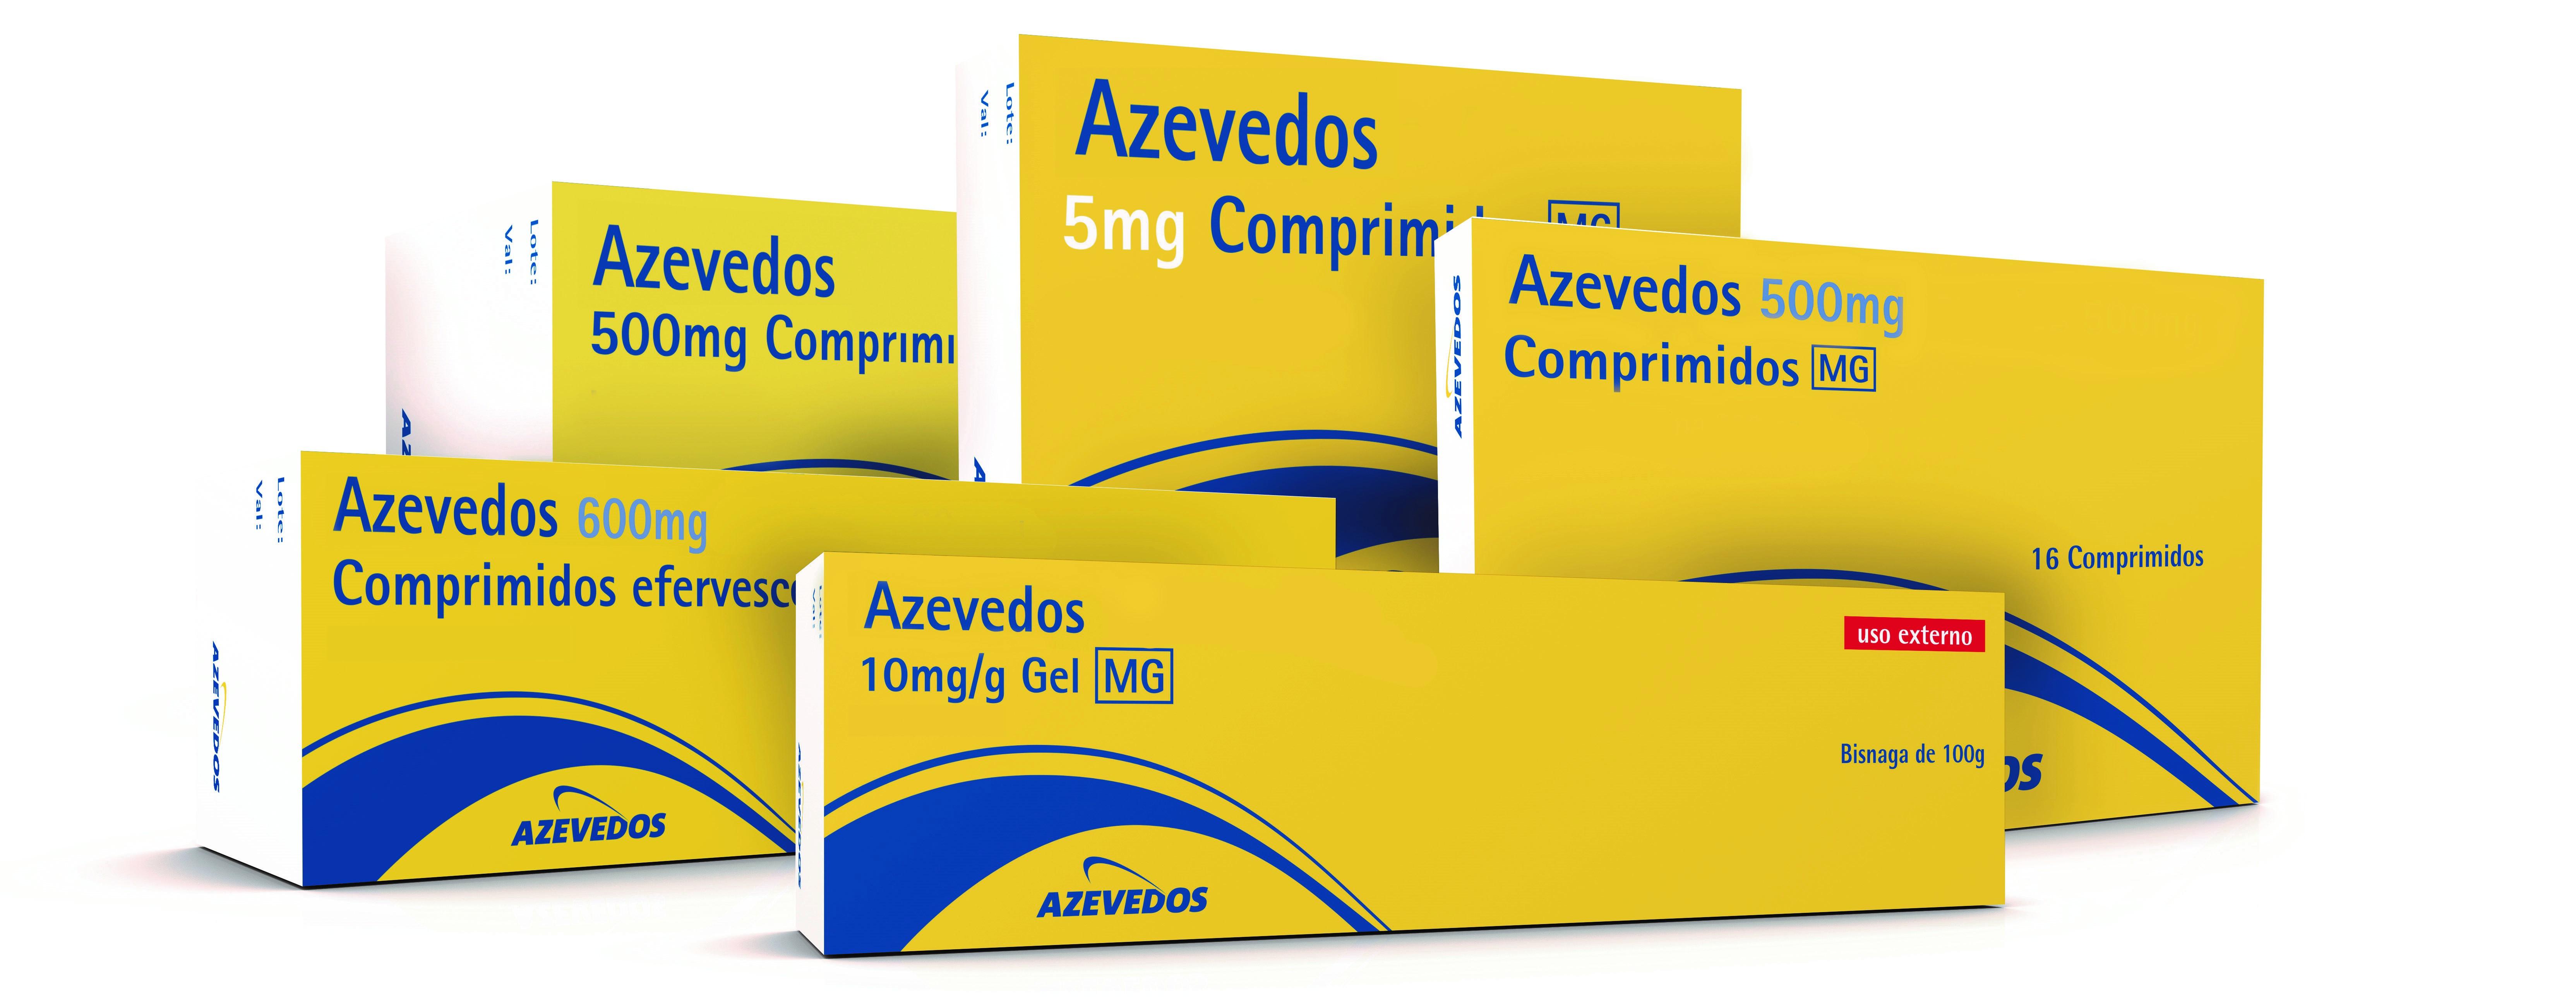 Generic (Olmesartan Medoximil + HCTZ)